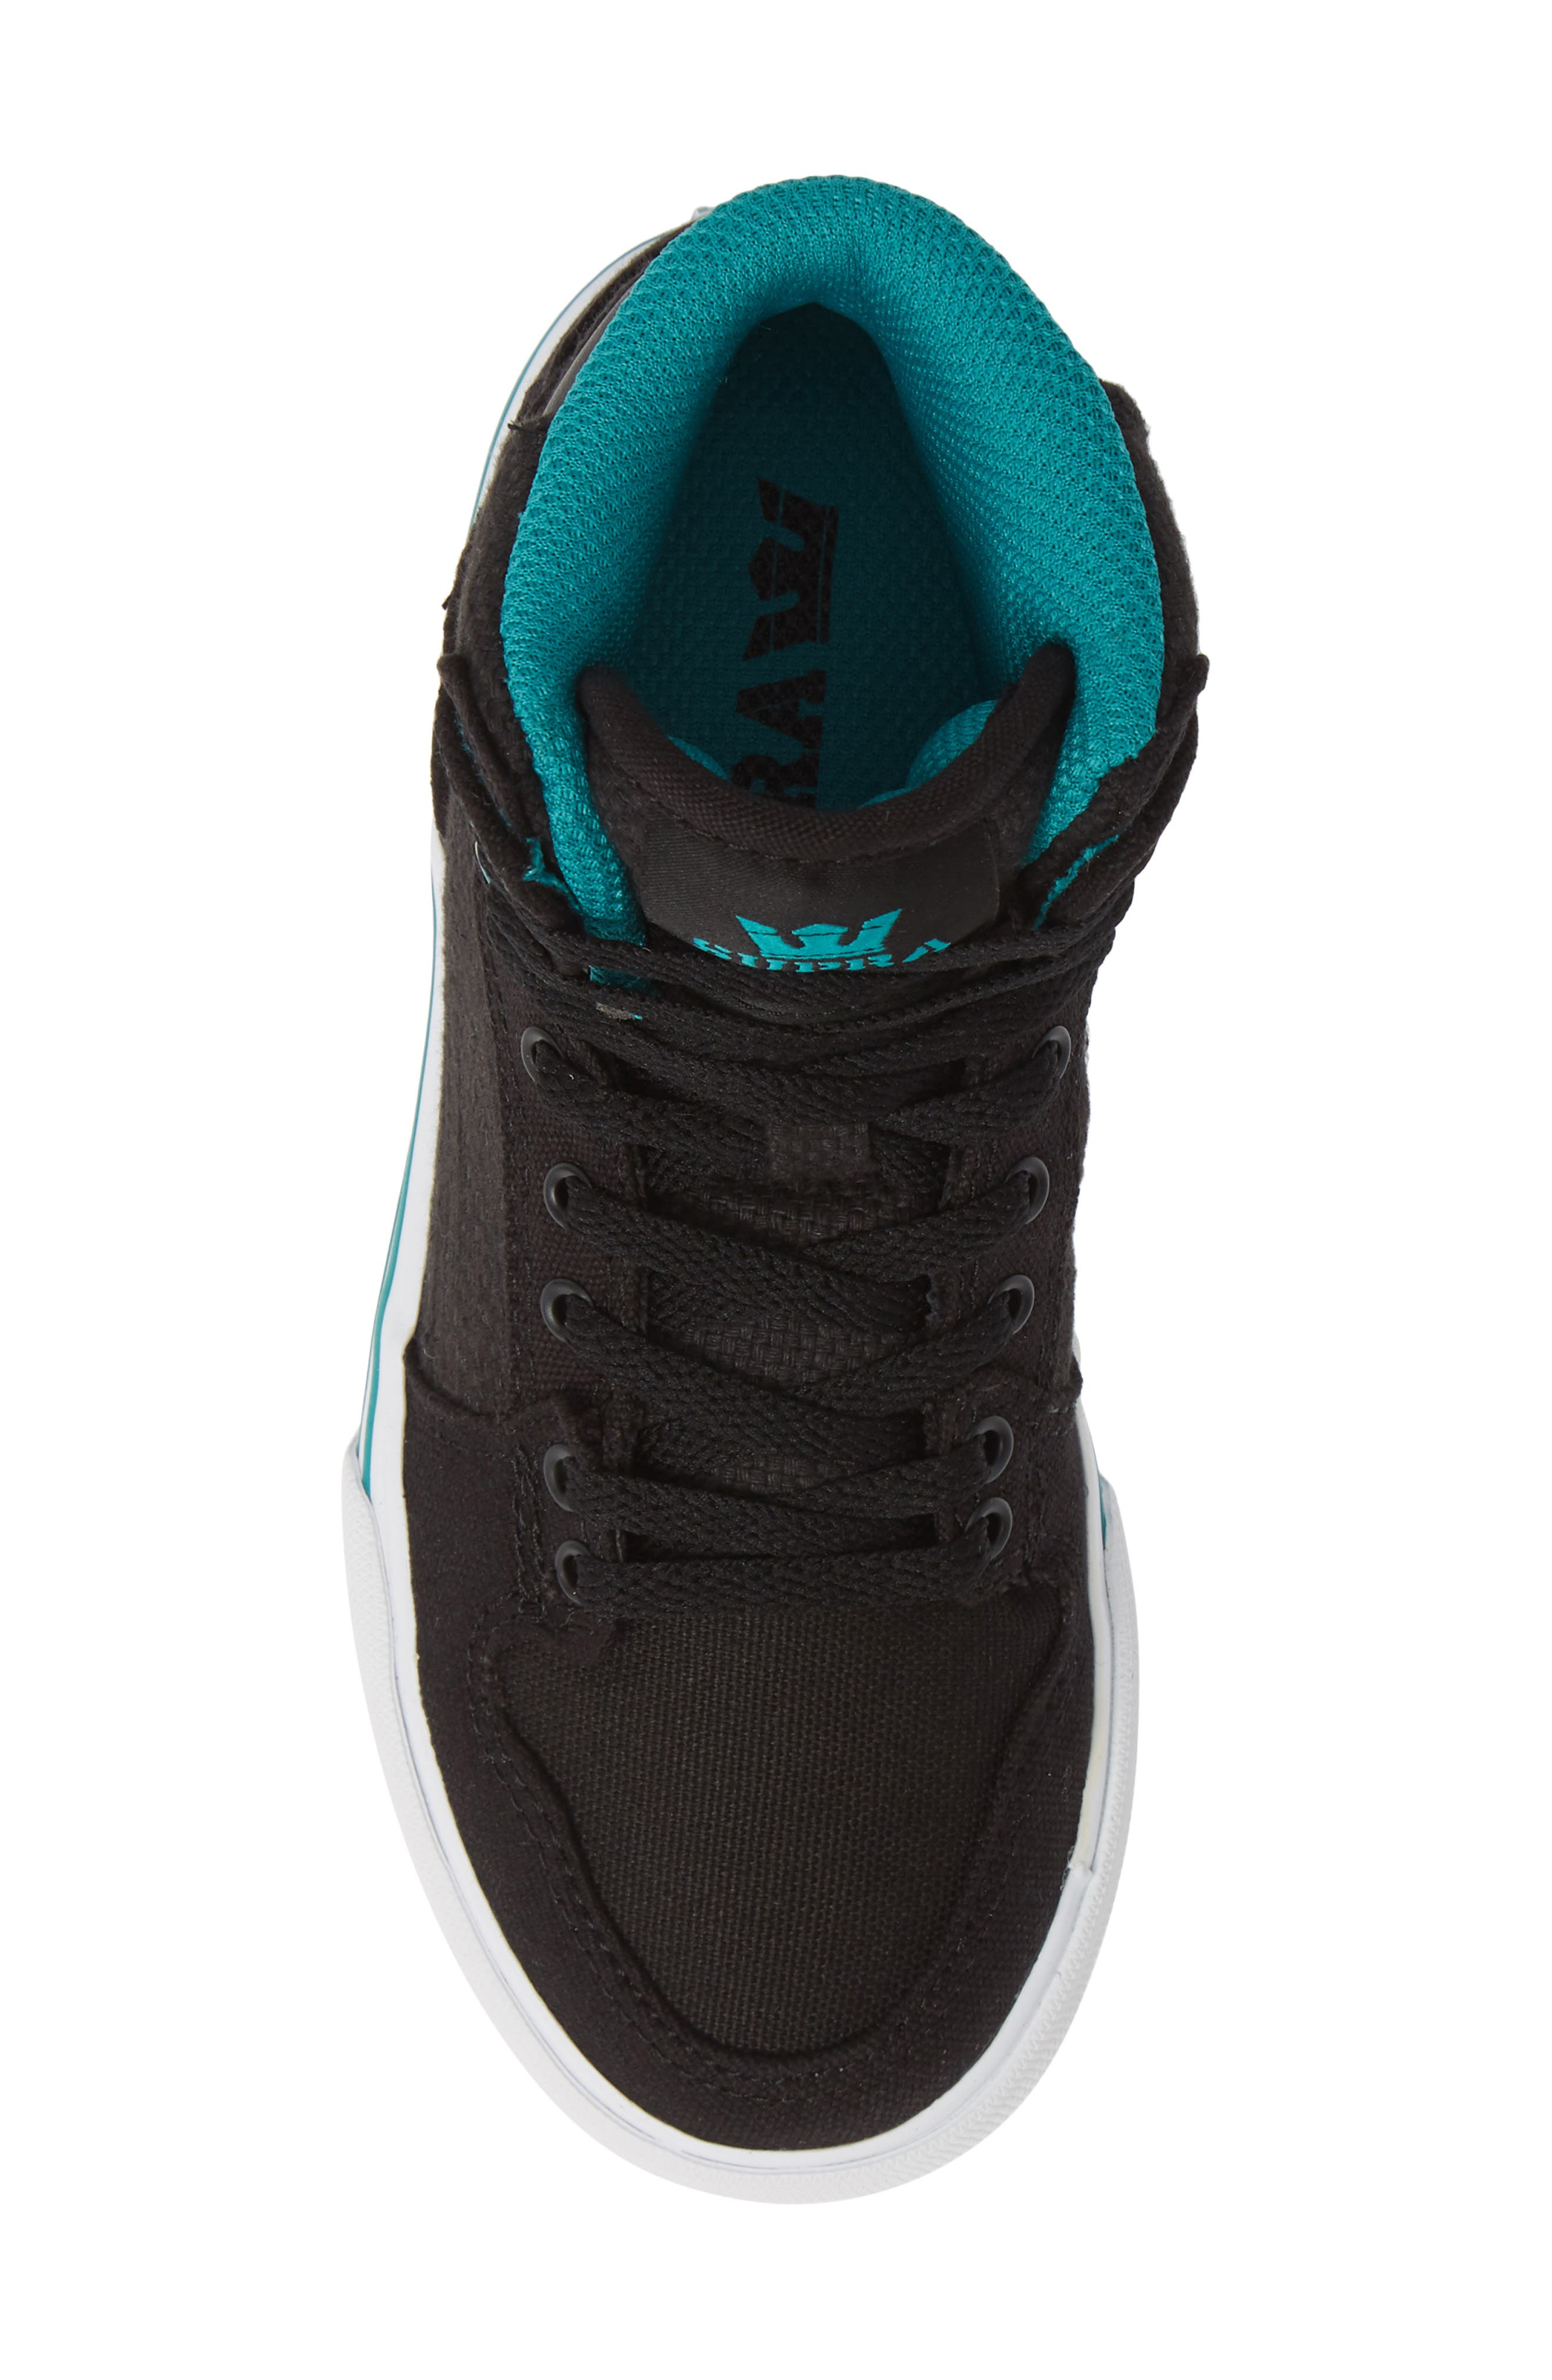 'Vaider' High Top Sneaker,                             Alternate thumbnail 5, color,                             BLACK/ TEAL